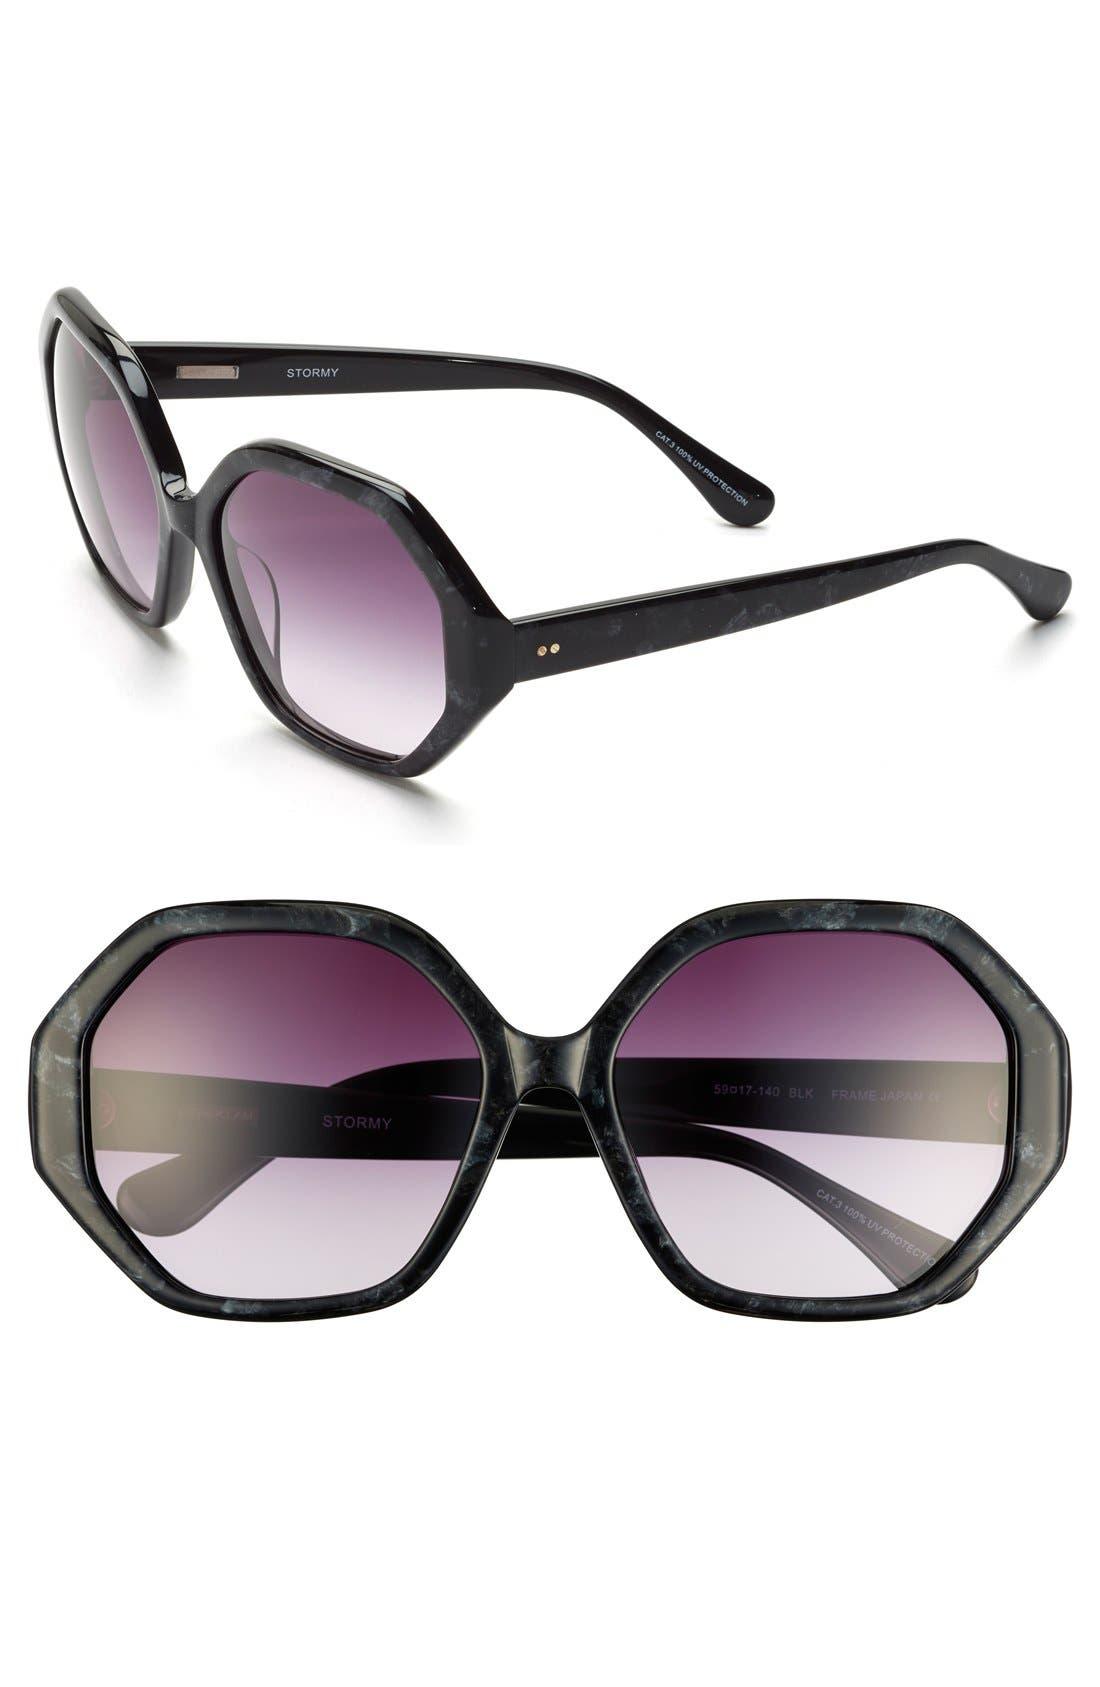 Main Image - Derek Lam 'Stormy' 59mm Sunglasses